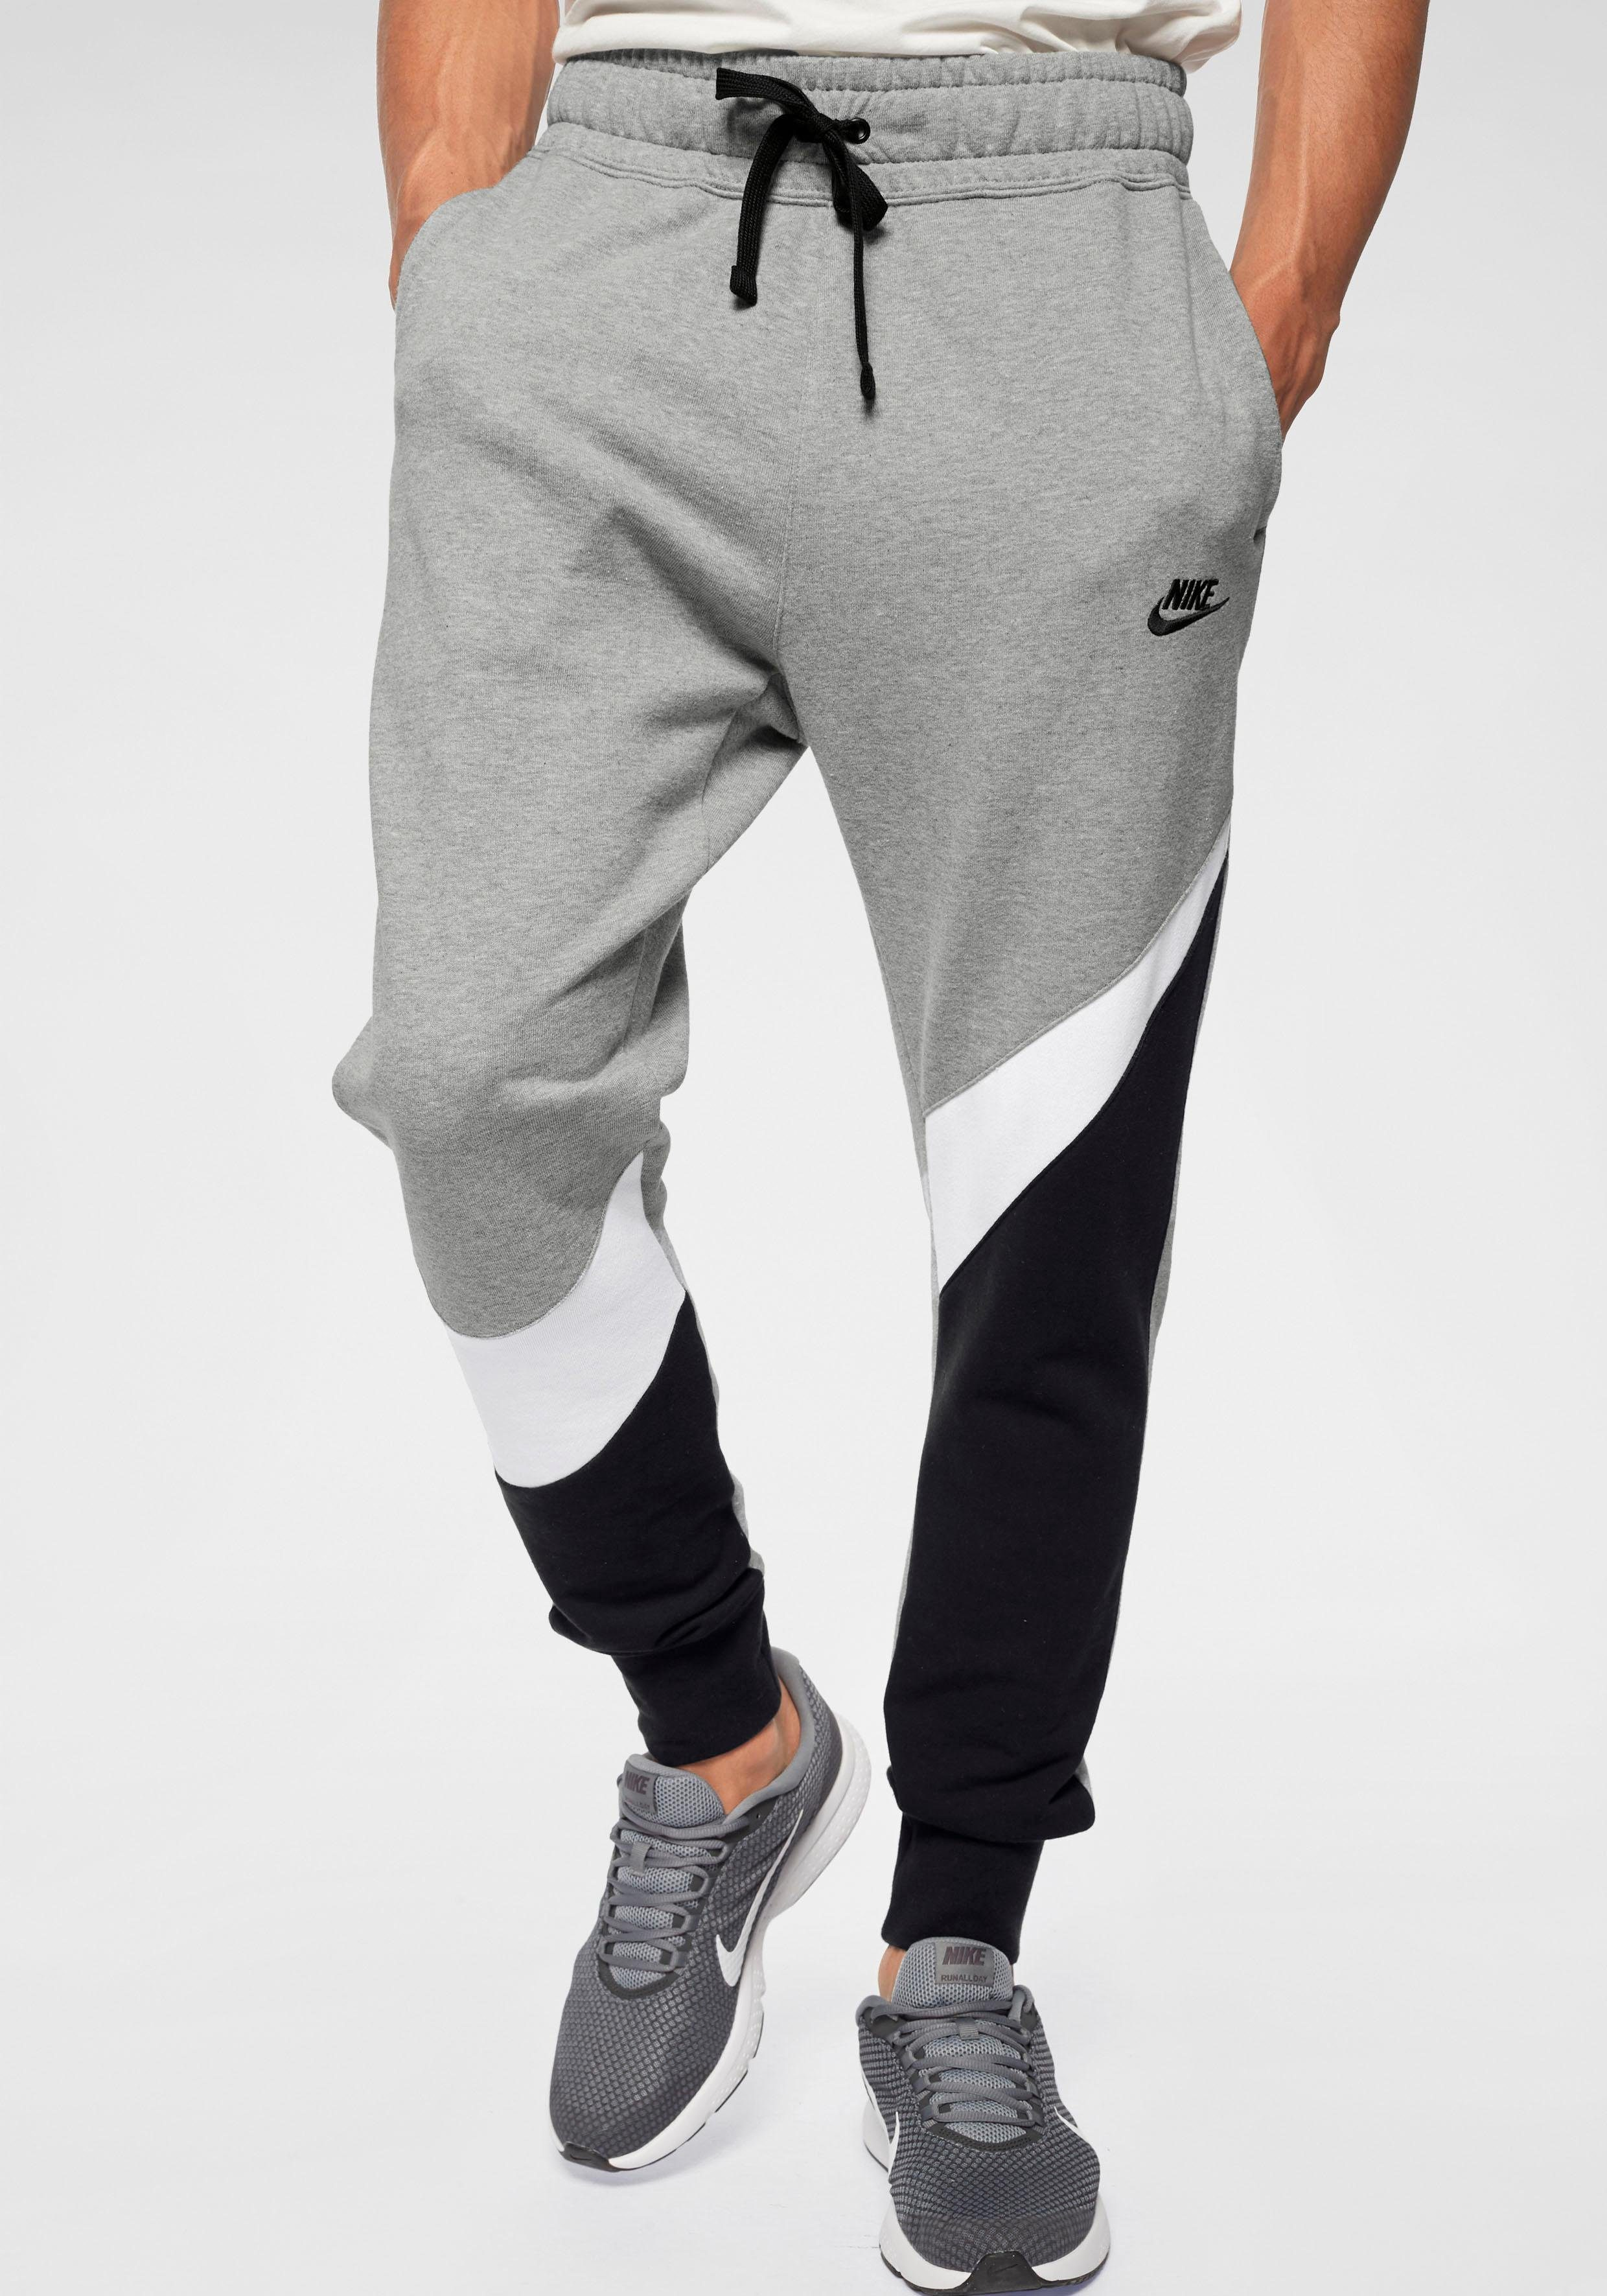 Nike Sportswear Jogginghose »M NSW HBR PANT FT STMT« online kaufen | OTTO